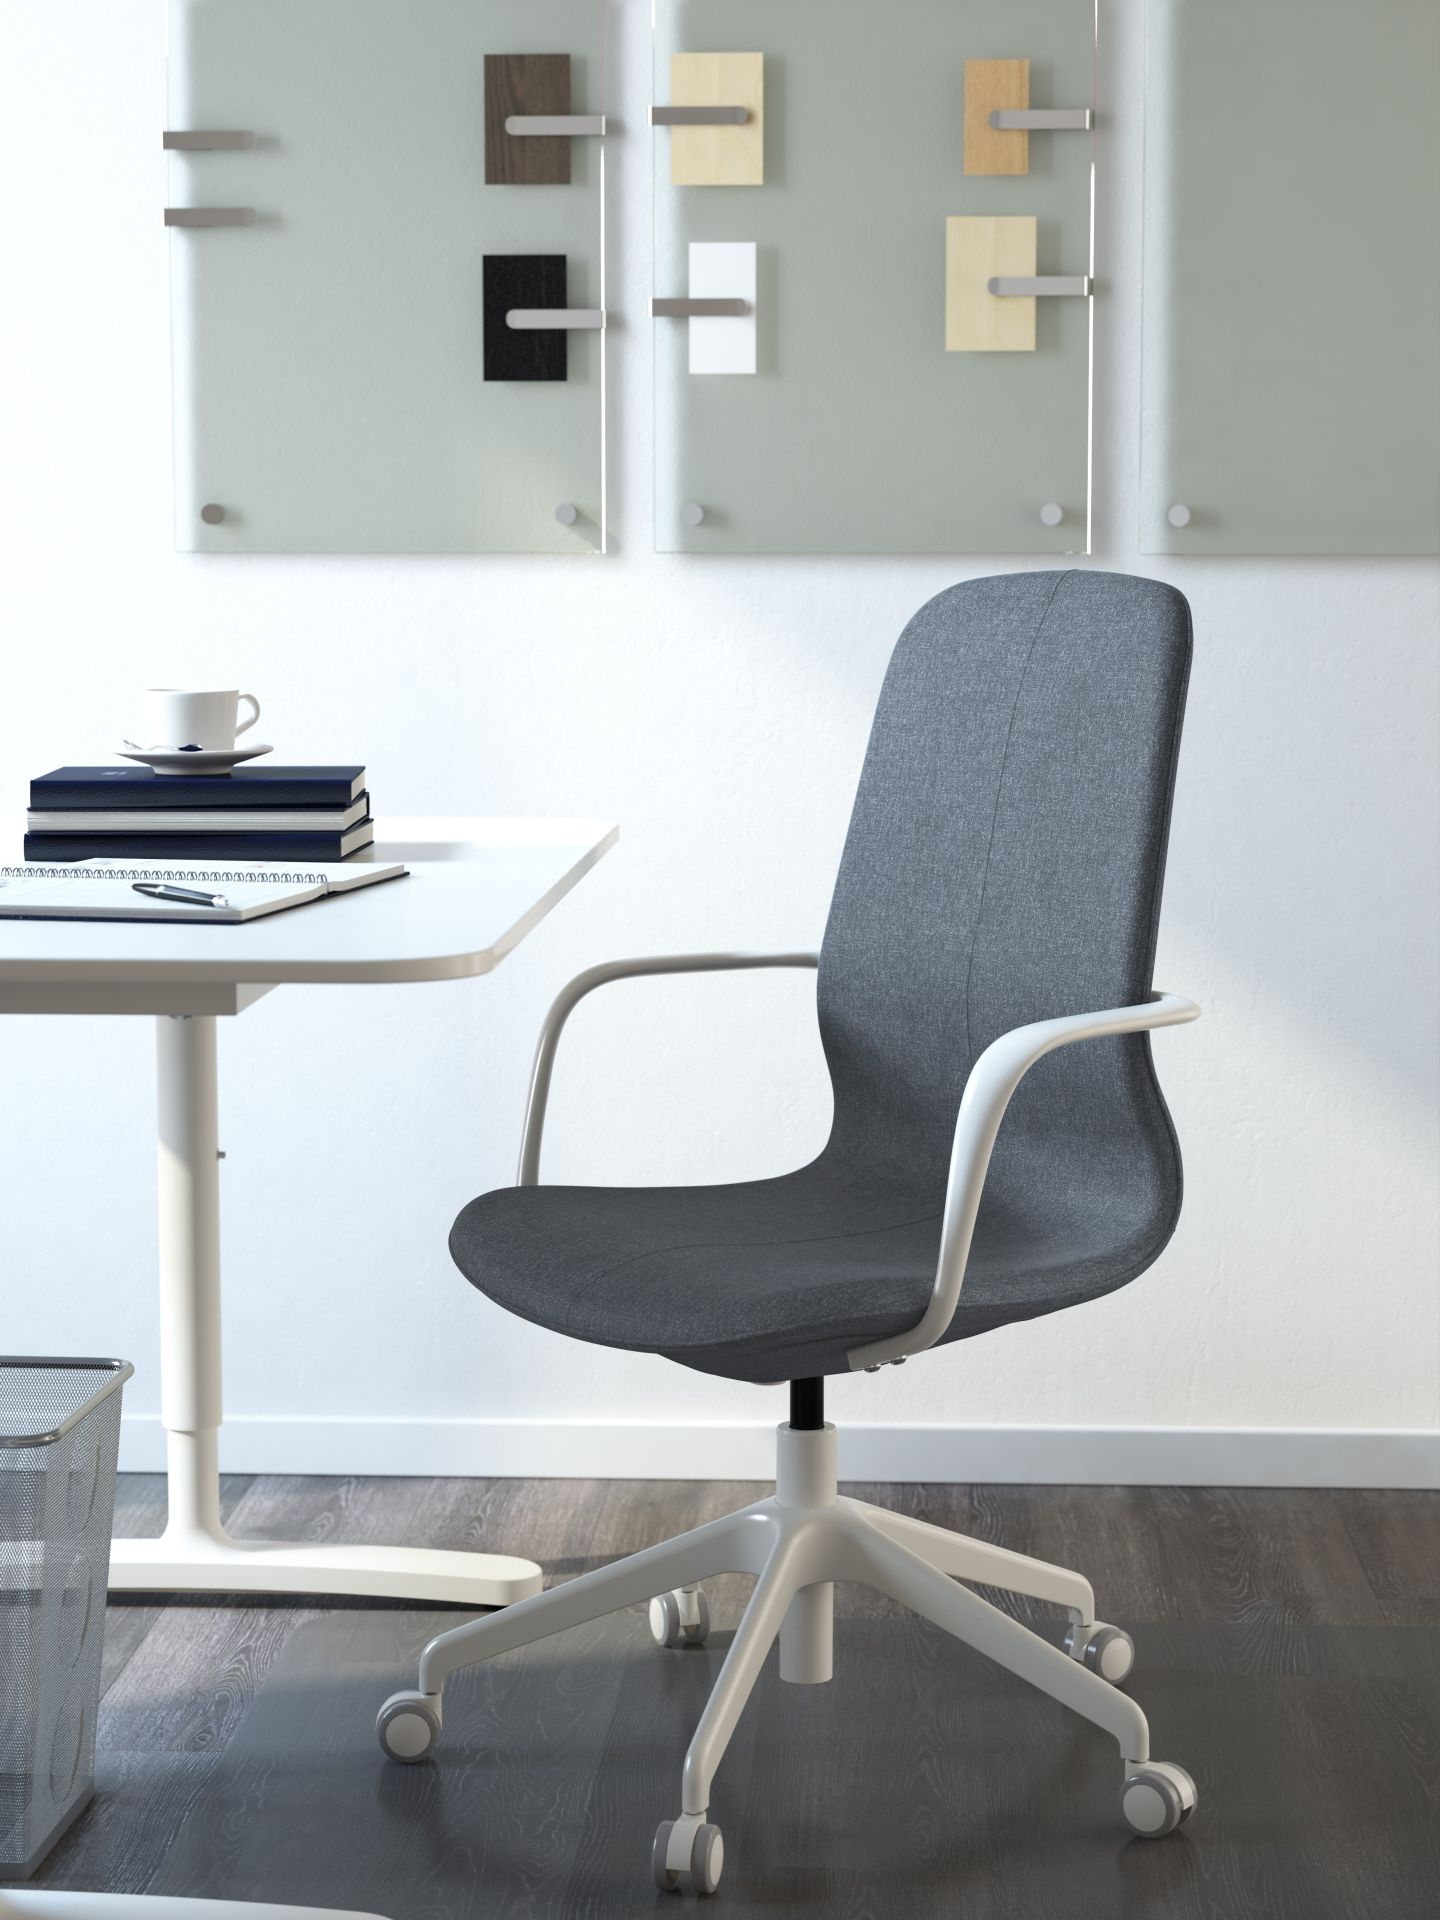 ikea ergonomic office chair. LÅNGFJÄLL Bureaustoel | IKEA IKEAnl IKEAnederland Stoel Werkplek Studeerkamer Werken Studeren Bureau Werk Grijs Wit Ergonomisch Ikea Ergonomic Office Chair